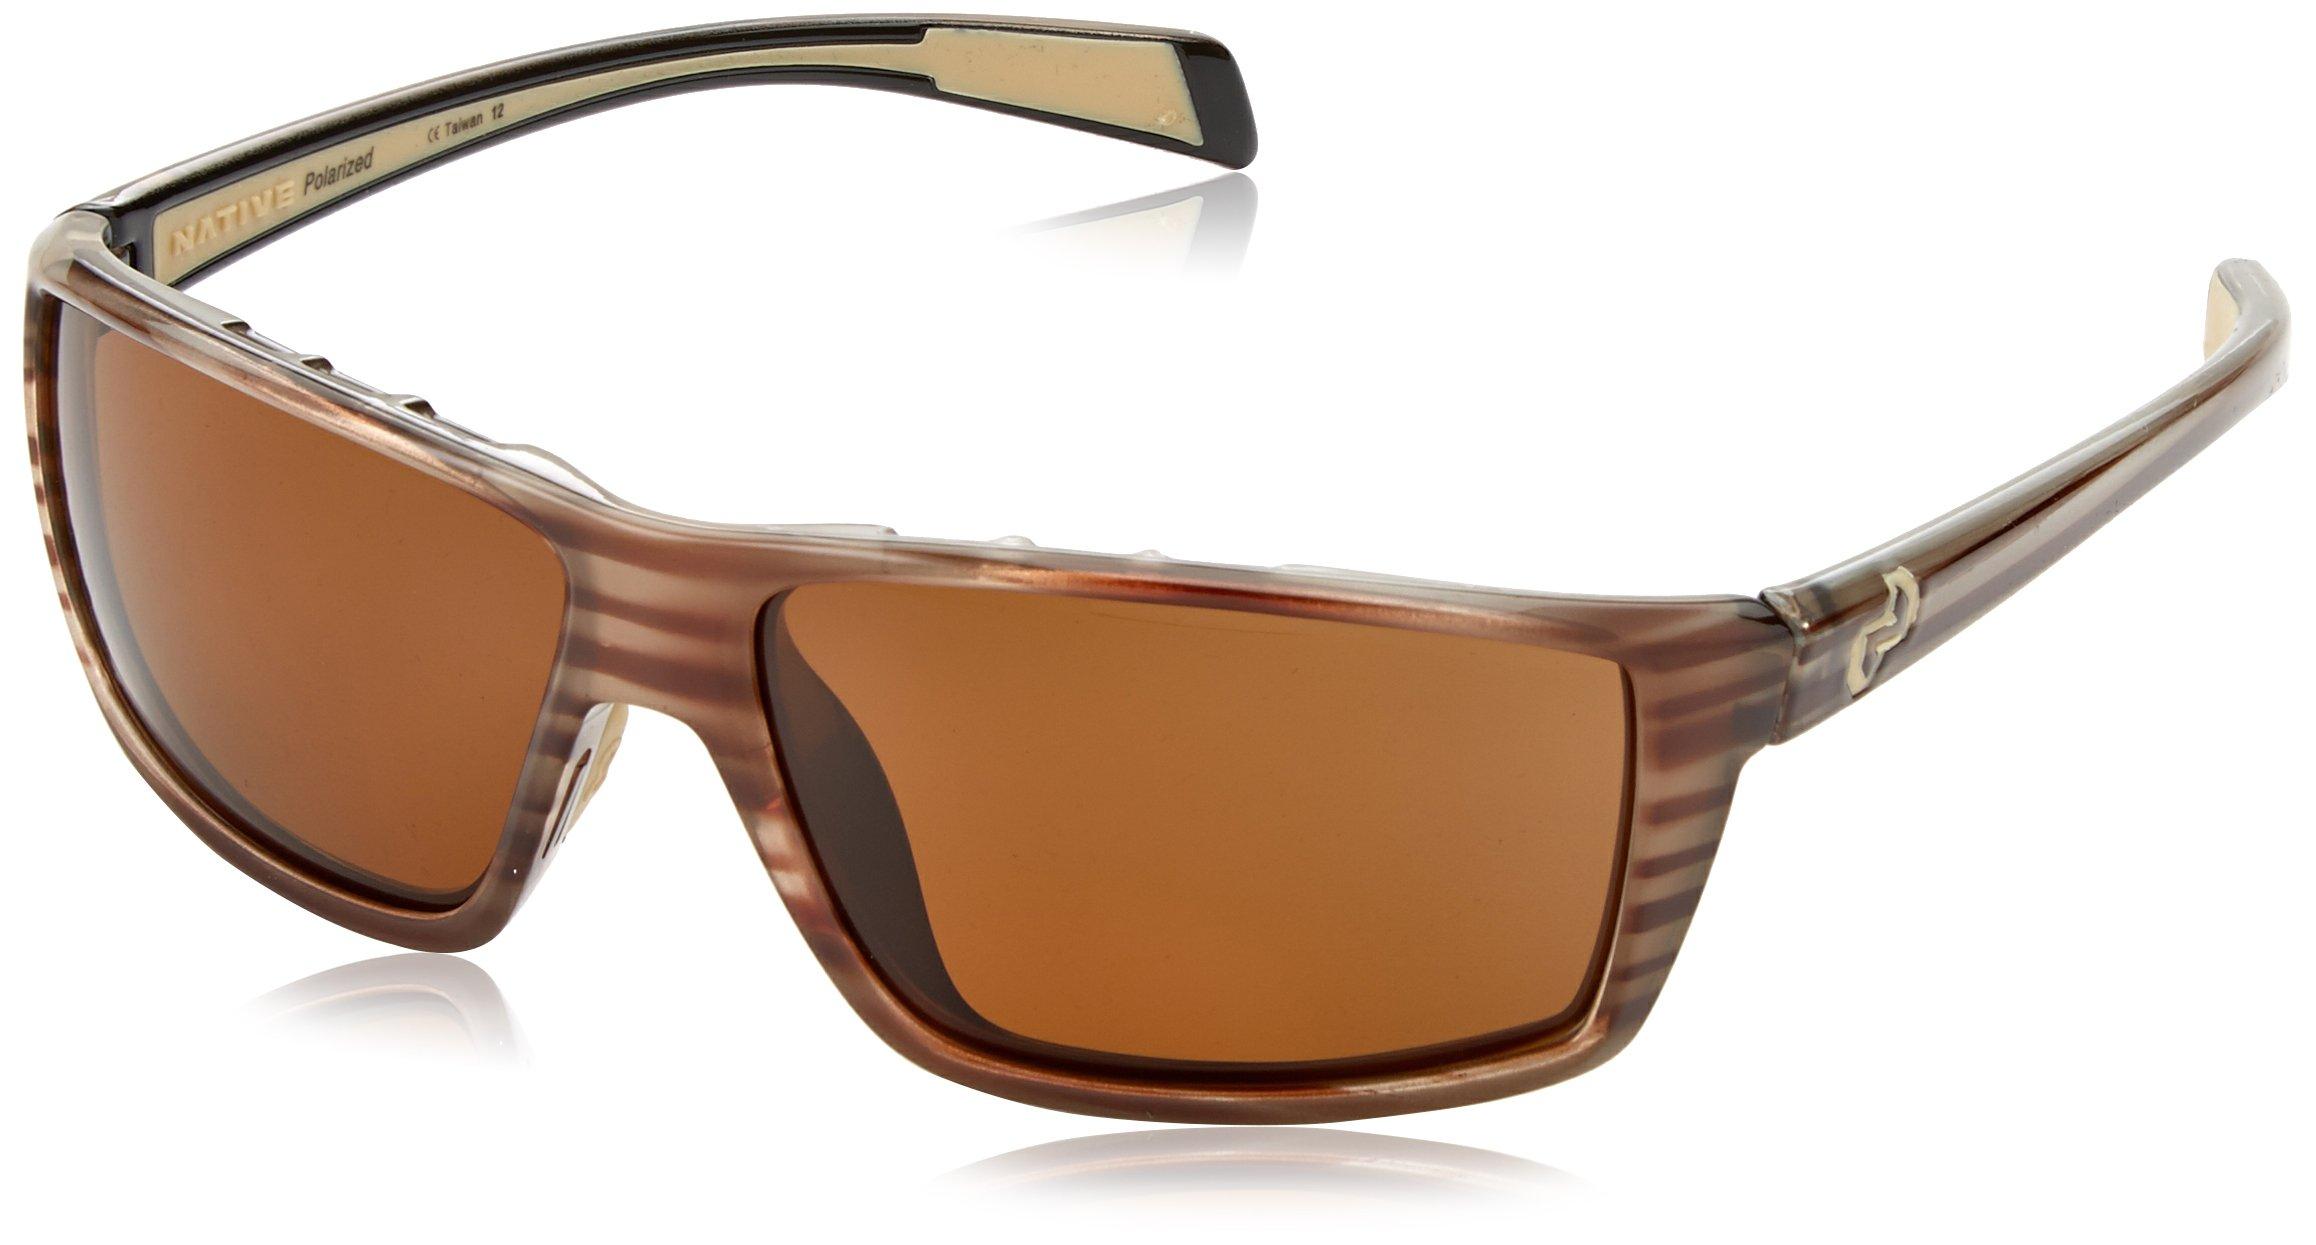 Native Eyewear Sidecar Polarized Sunglasses, Brown, Wood